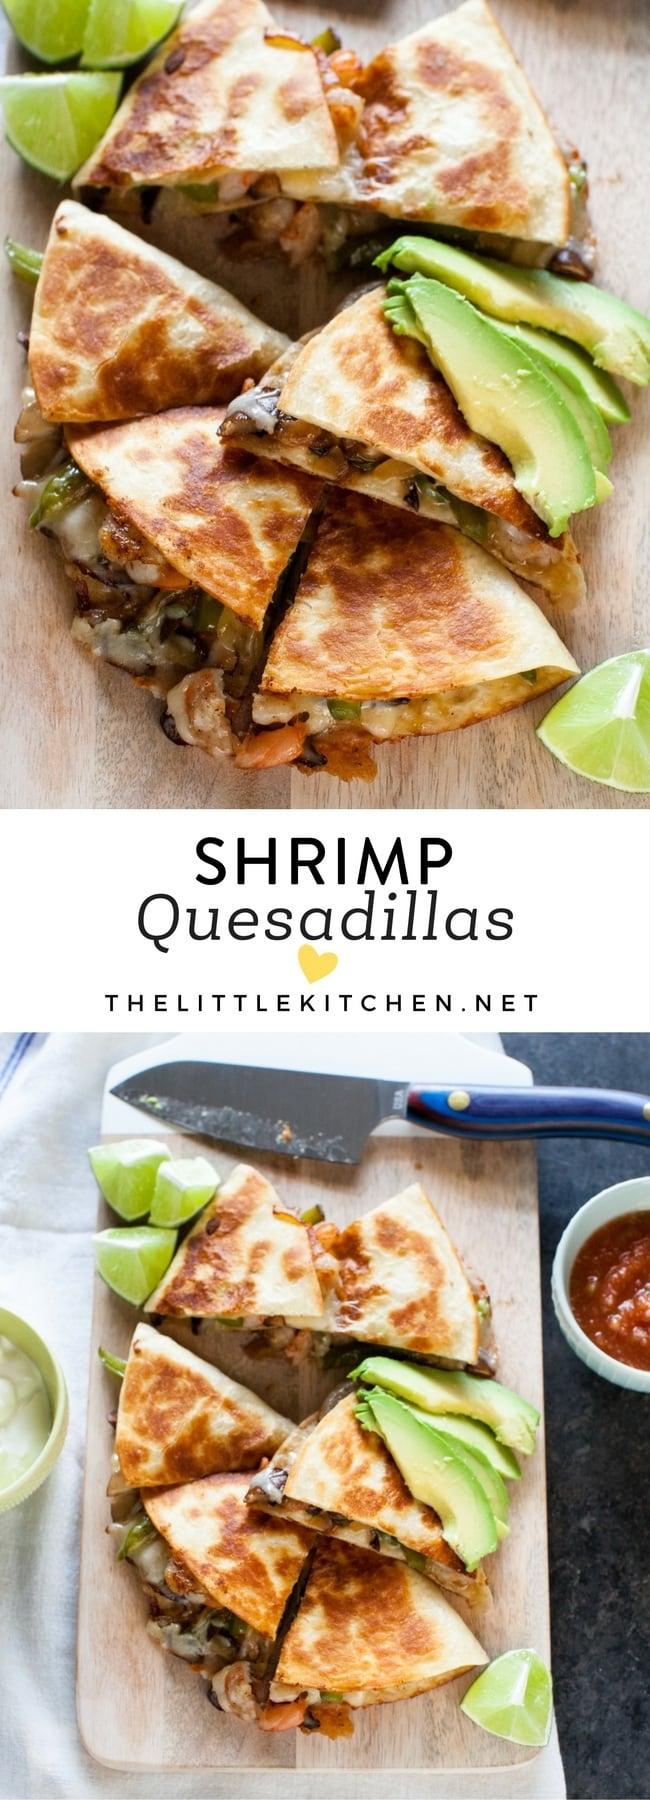 Shrimp Quesadillas from thelittlekitchen.net